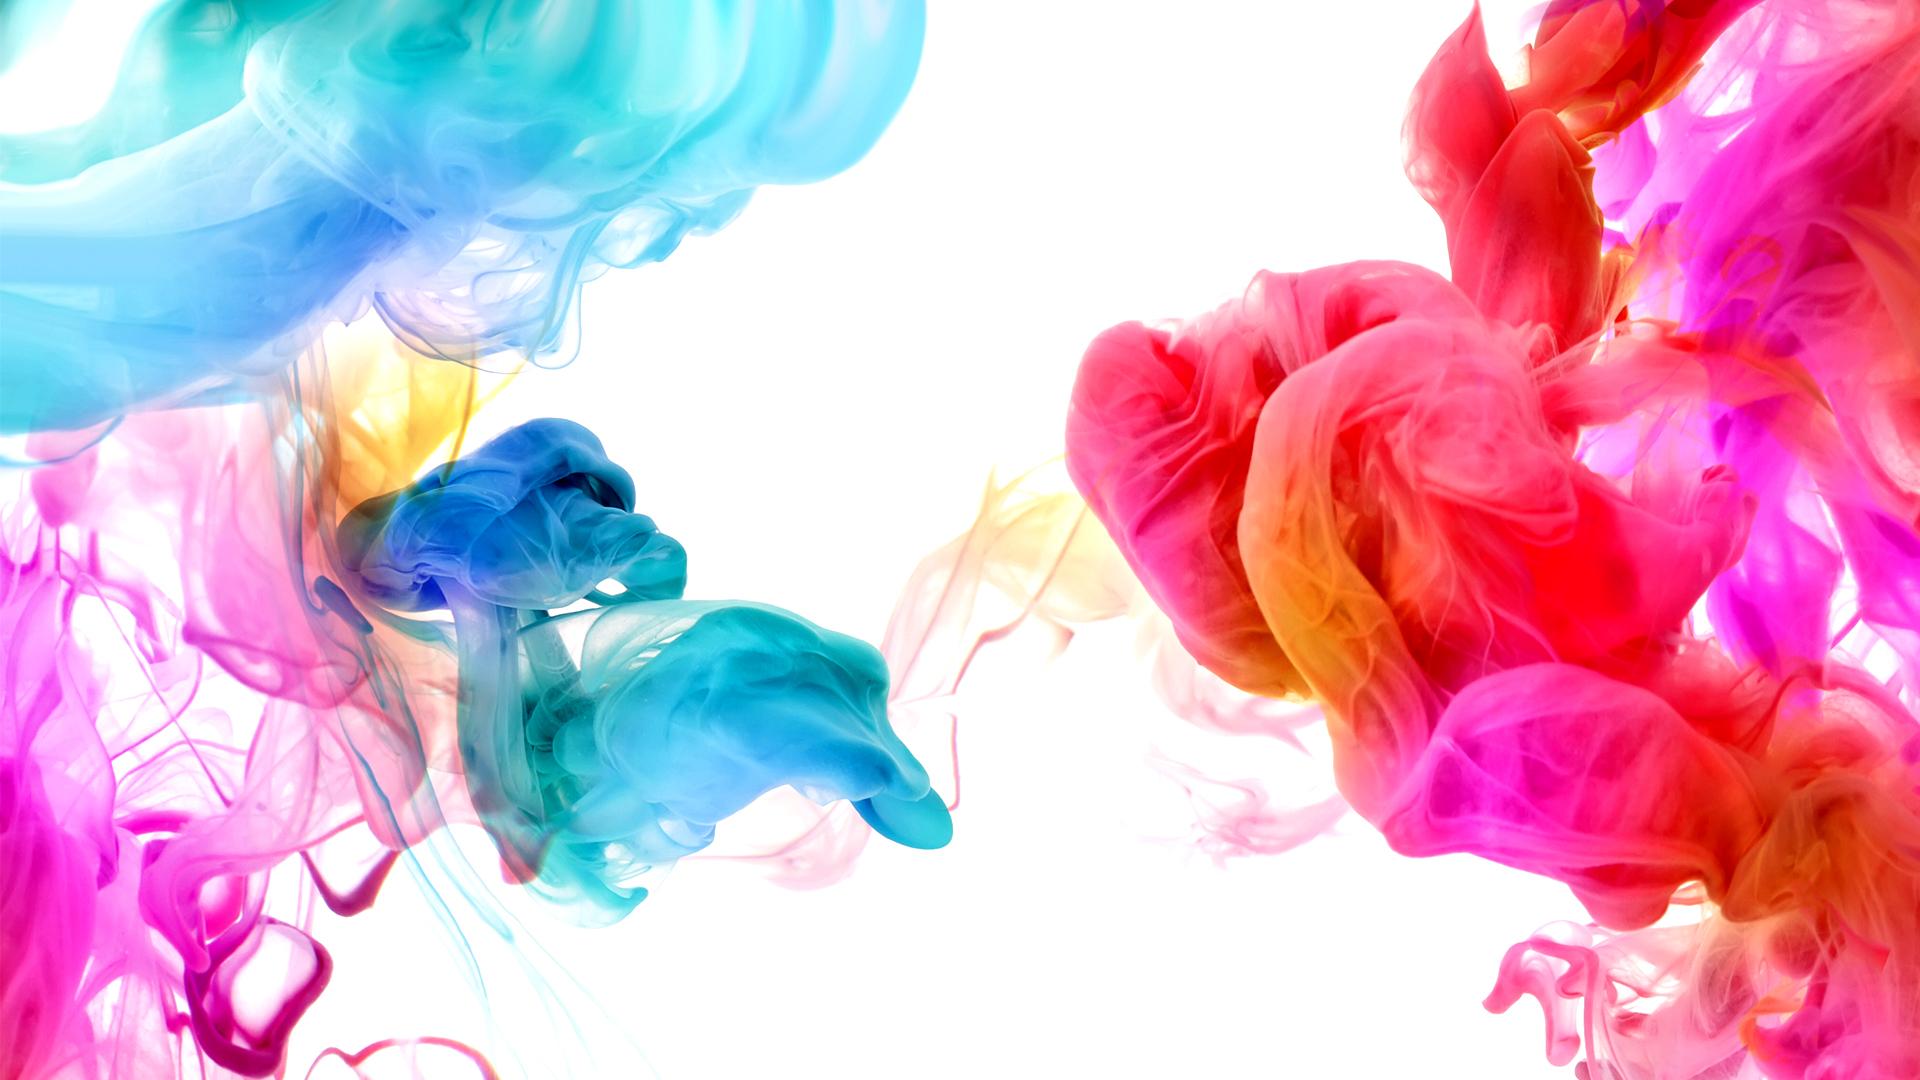 Ultra Hd Desktop Wallpapers Colorful Smoke Wallpapers Hd Wallpapers